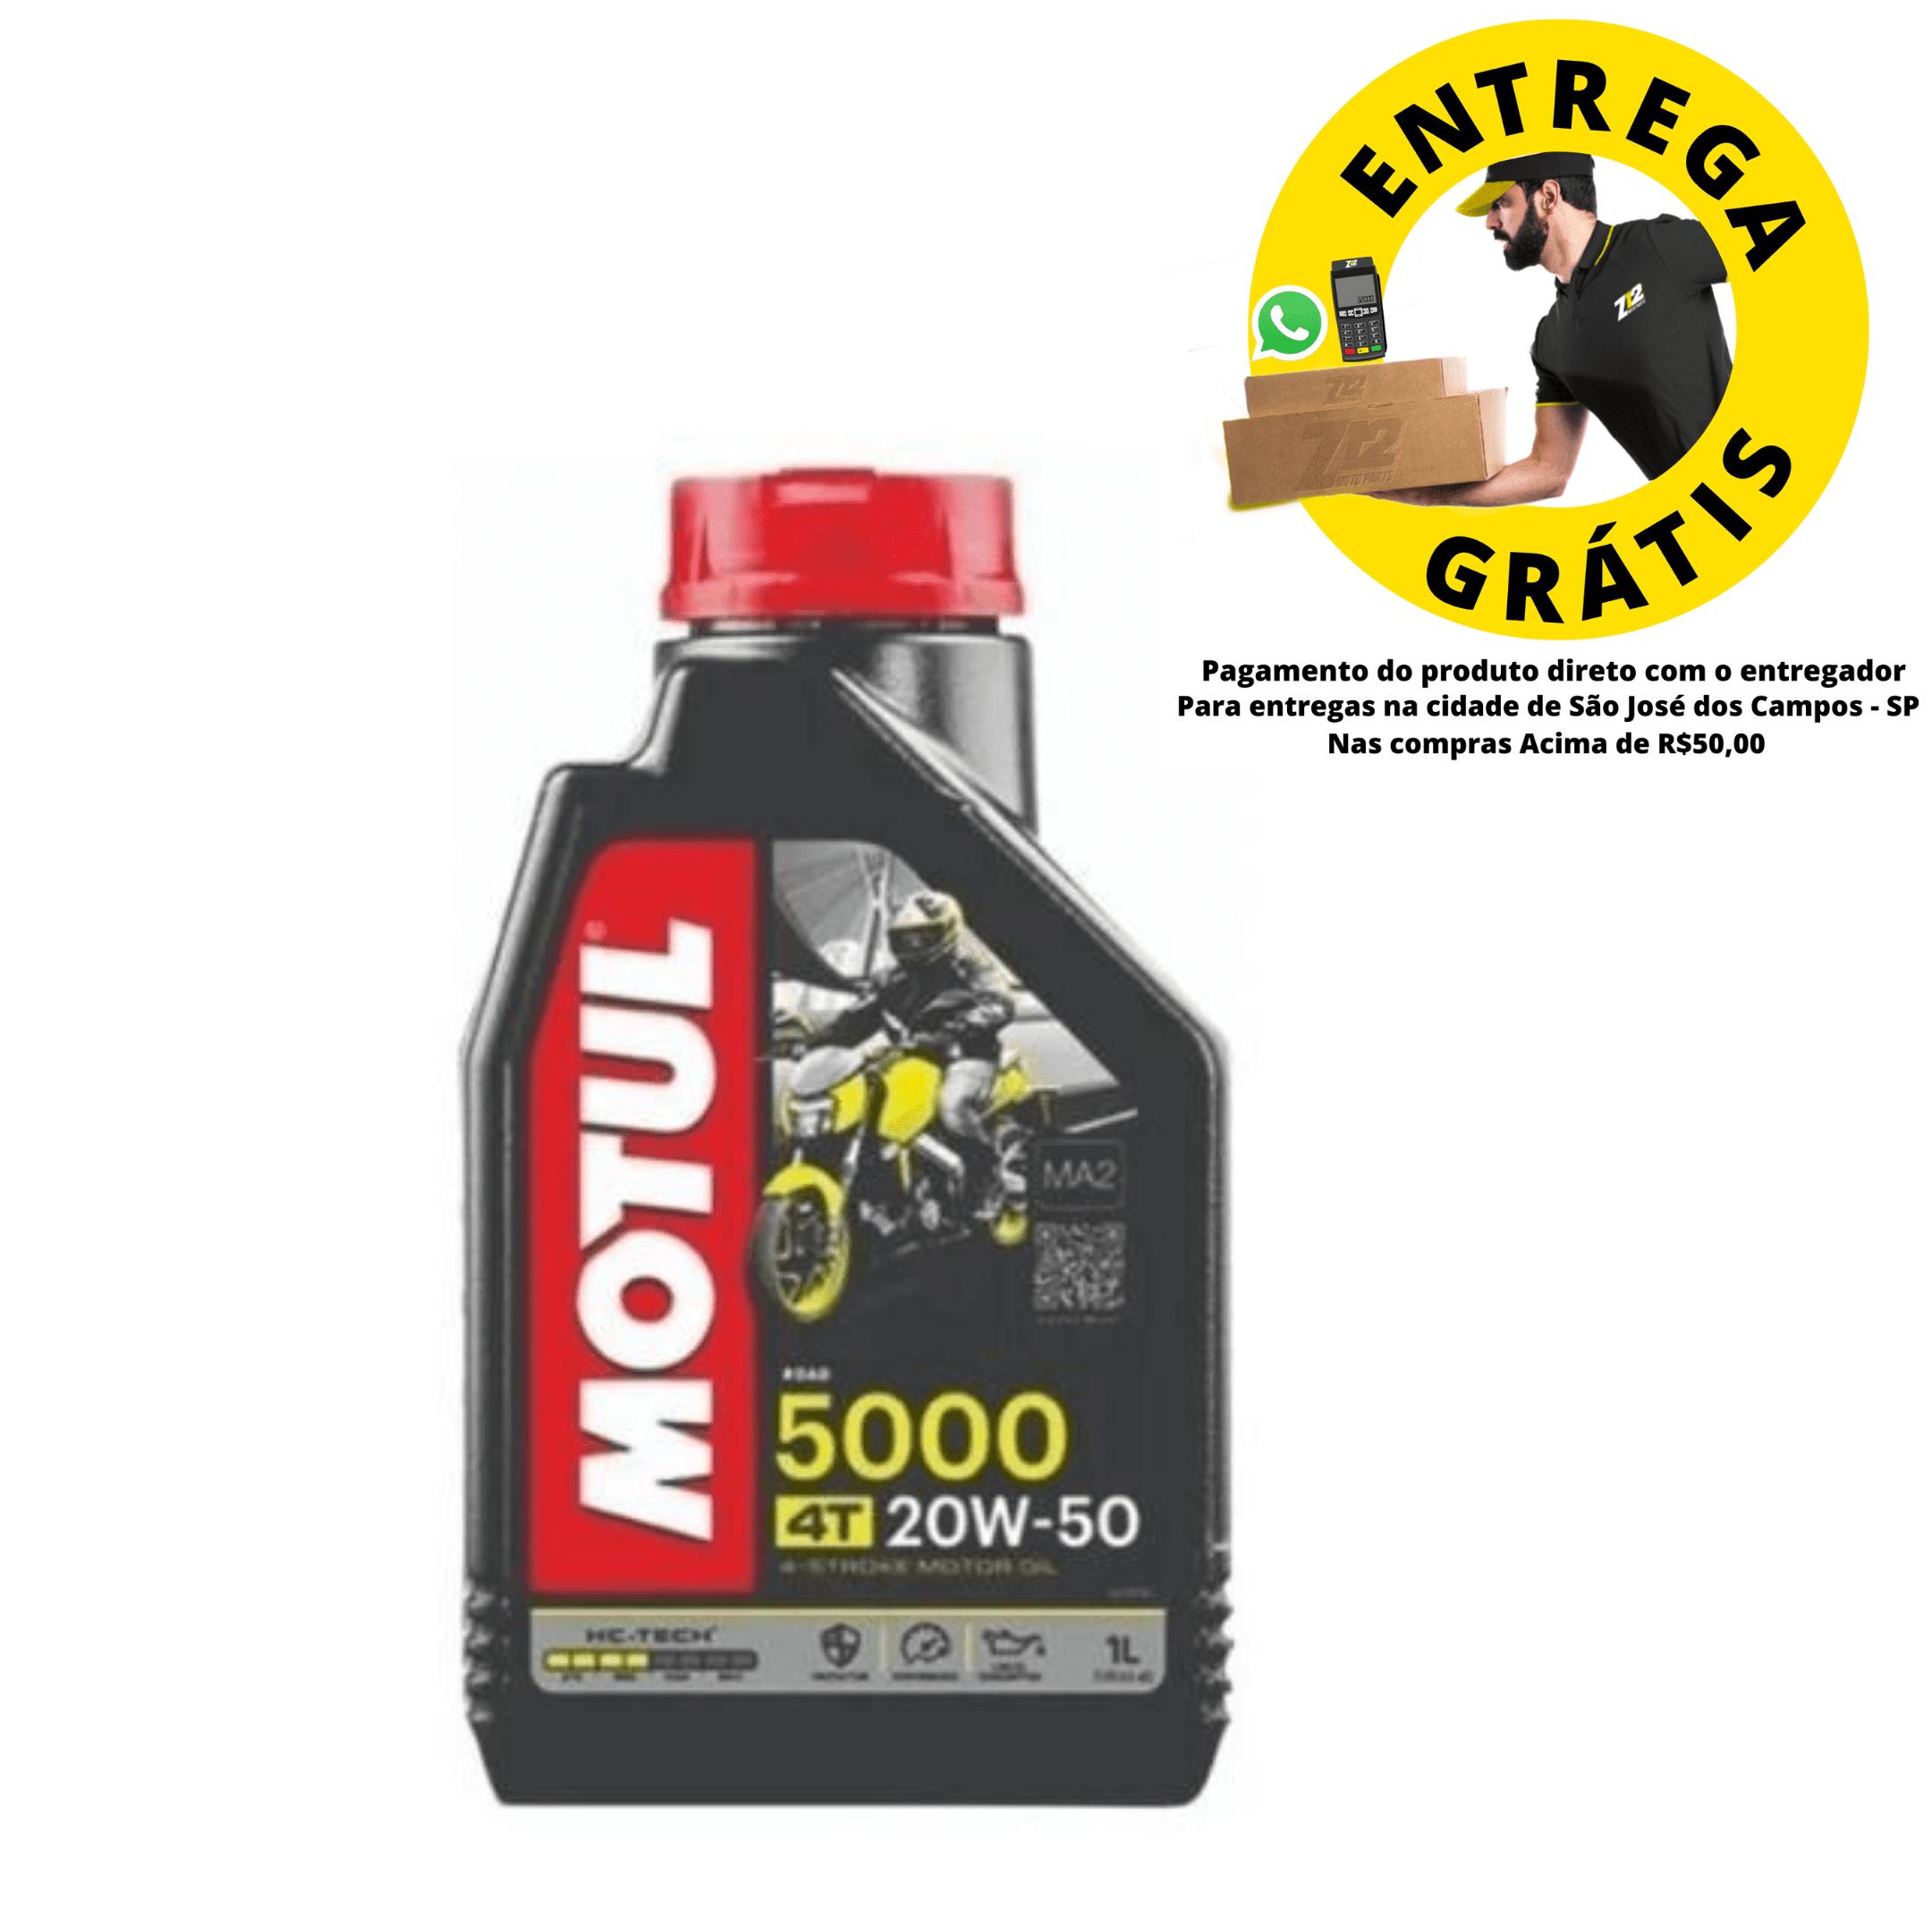 Oleo moto Motul 5000 20W50 4T - Titan / Falcon / Twister até 2008